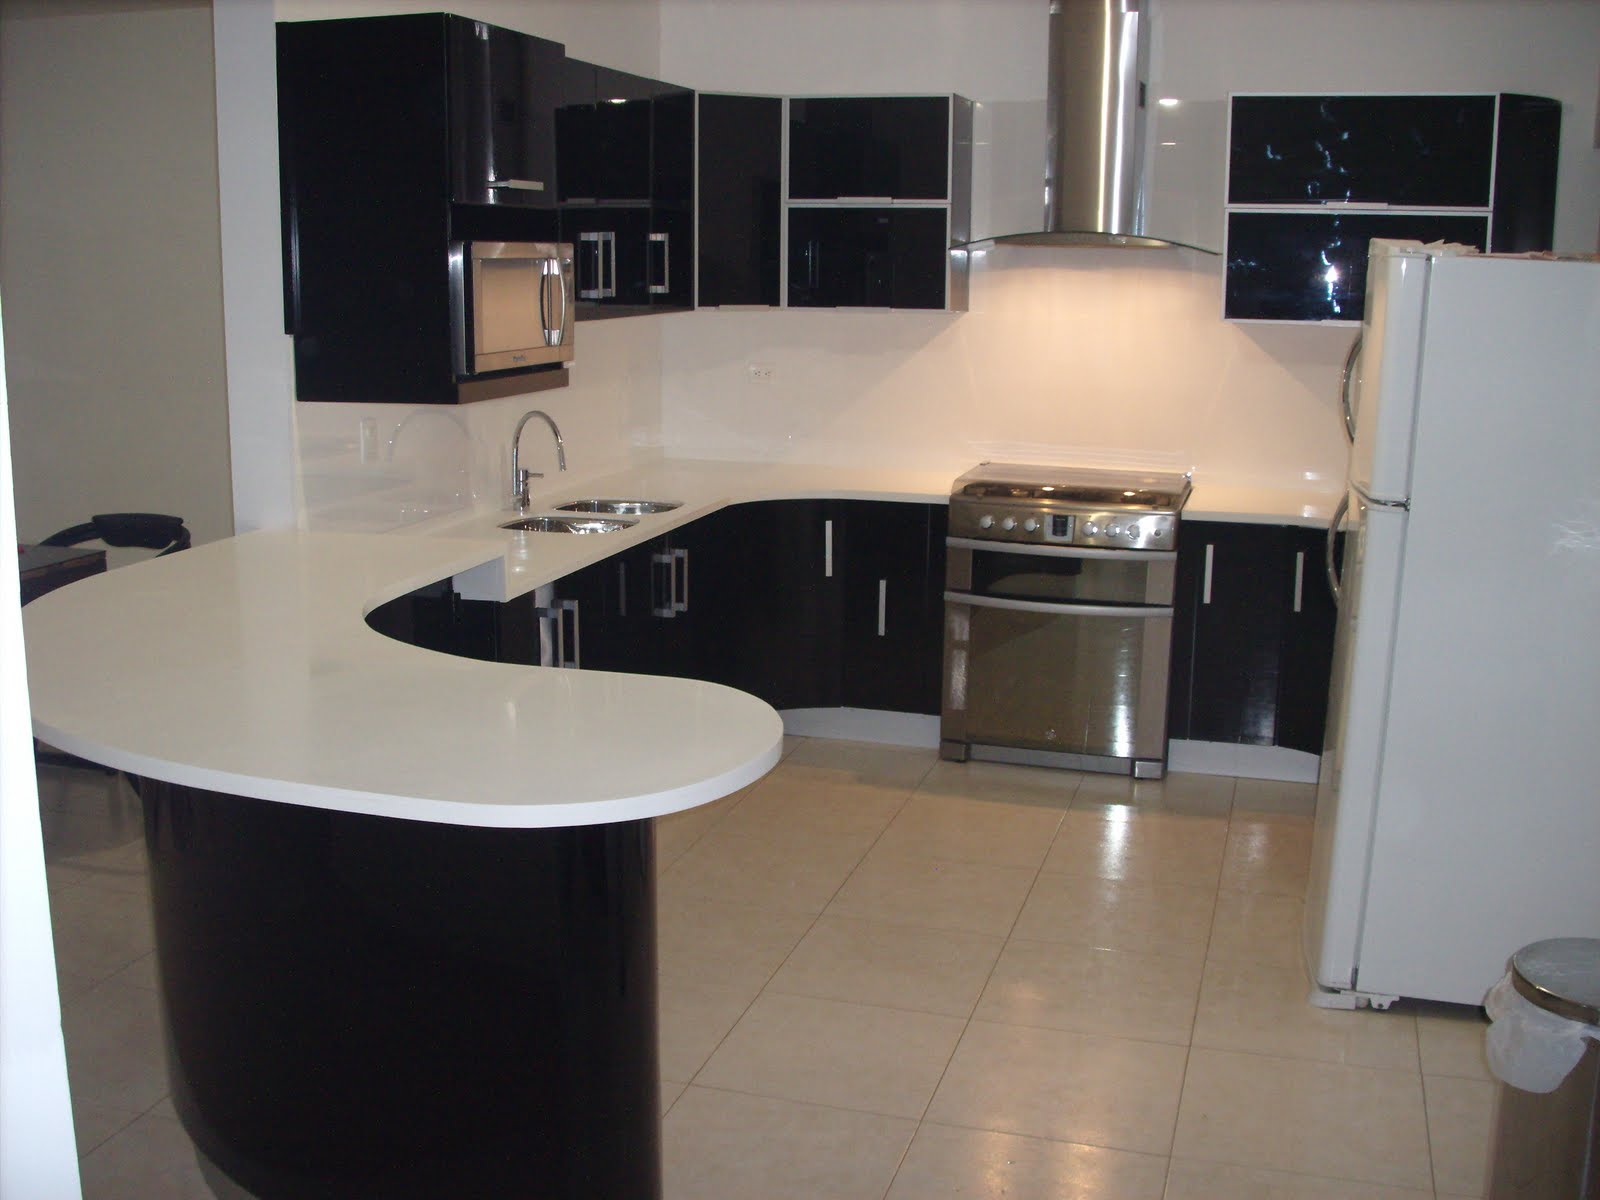 Heynez cocinas modernas cocina en negro con superficie s lida for Superficie cocina